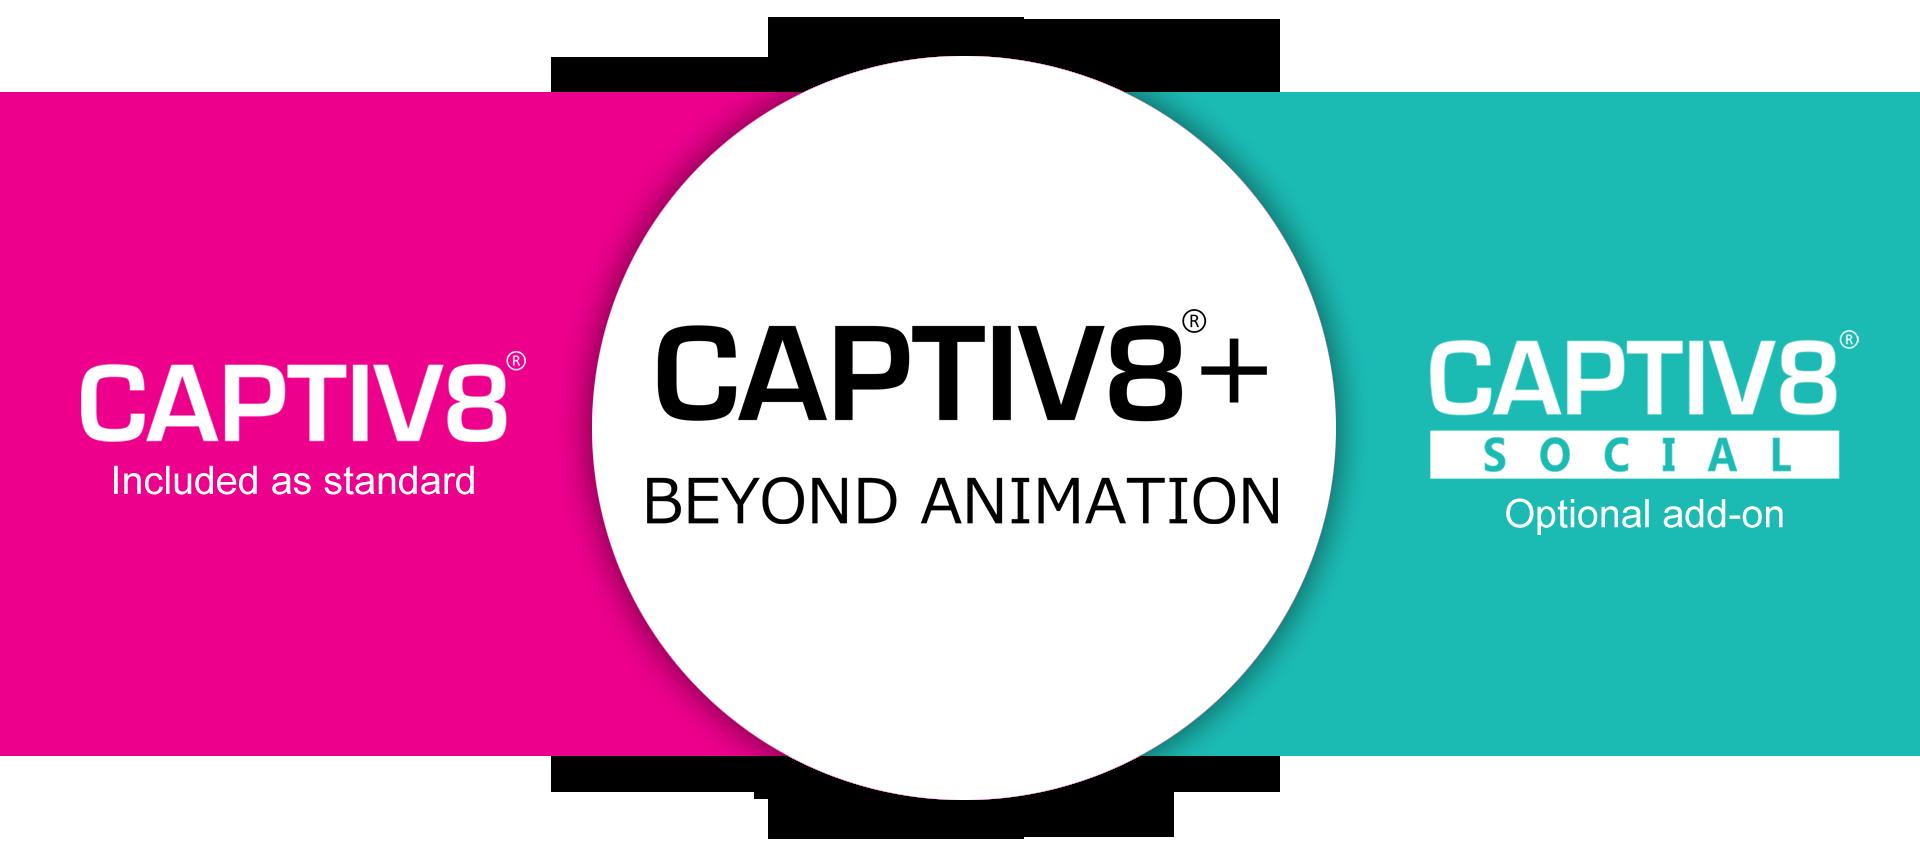 CAPTIV8+